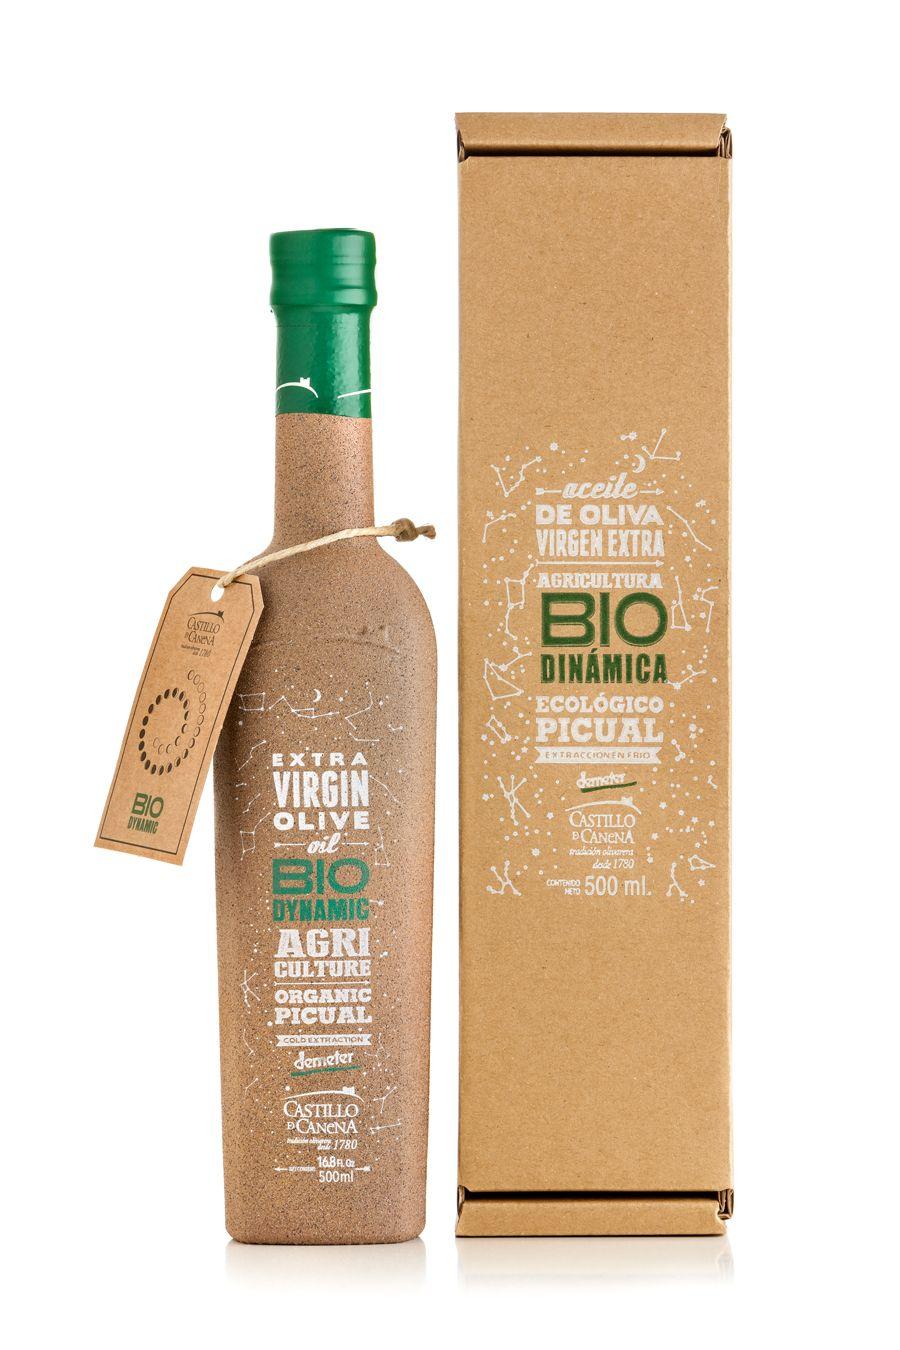 Image of Biodynamic Extra Virgin Olive Oil 500ml